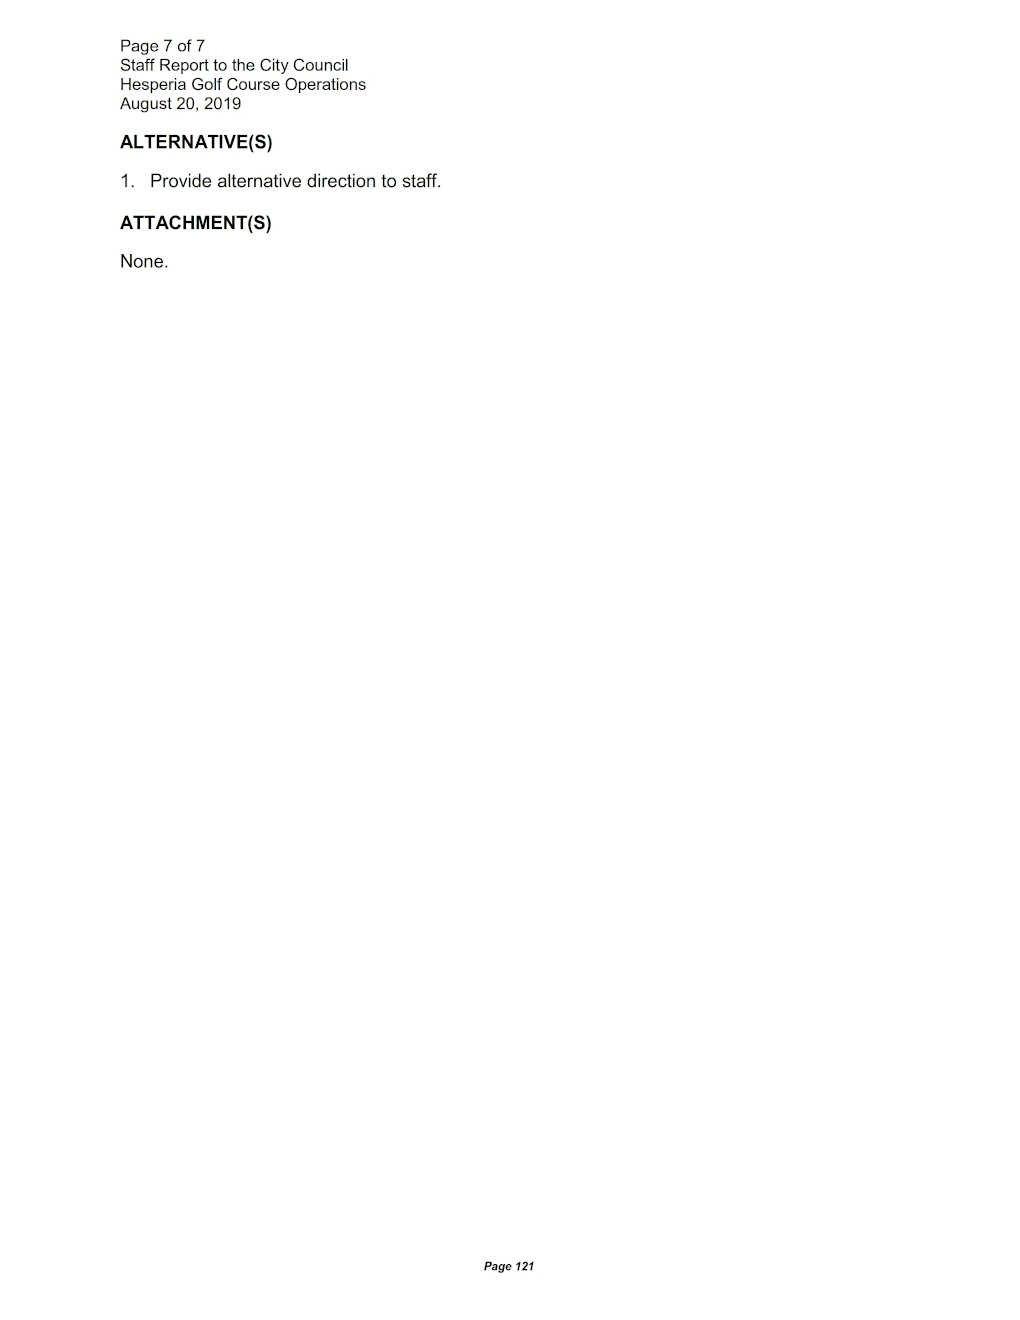 Hesperia Golf Course CFD 8-20-19 Staff Report 7